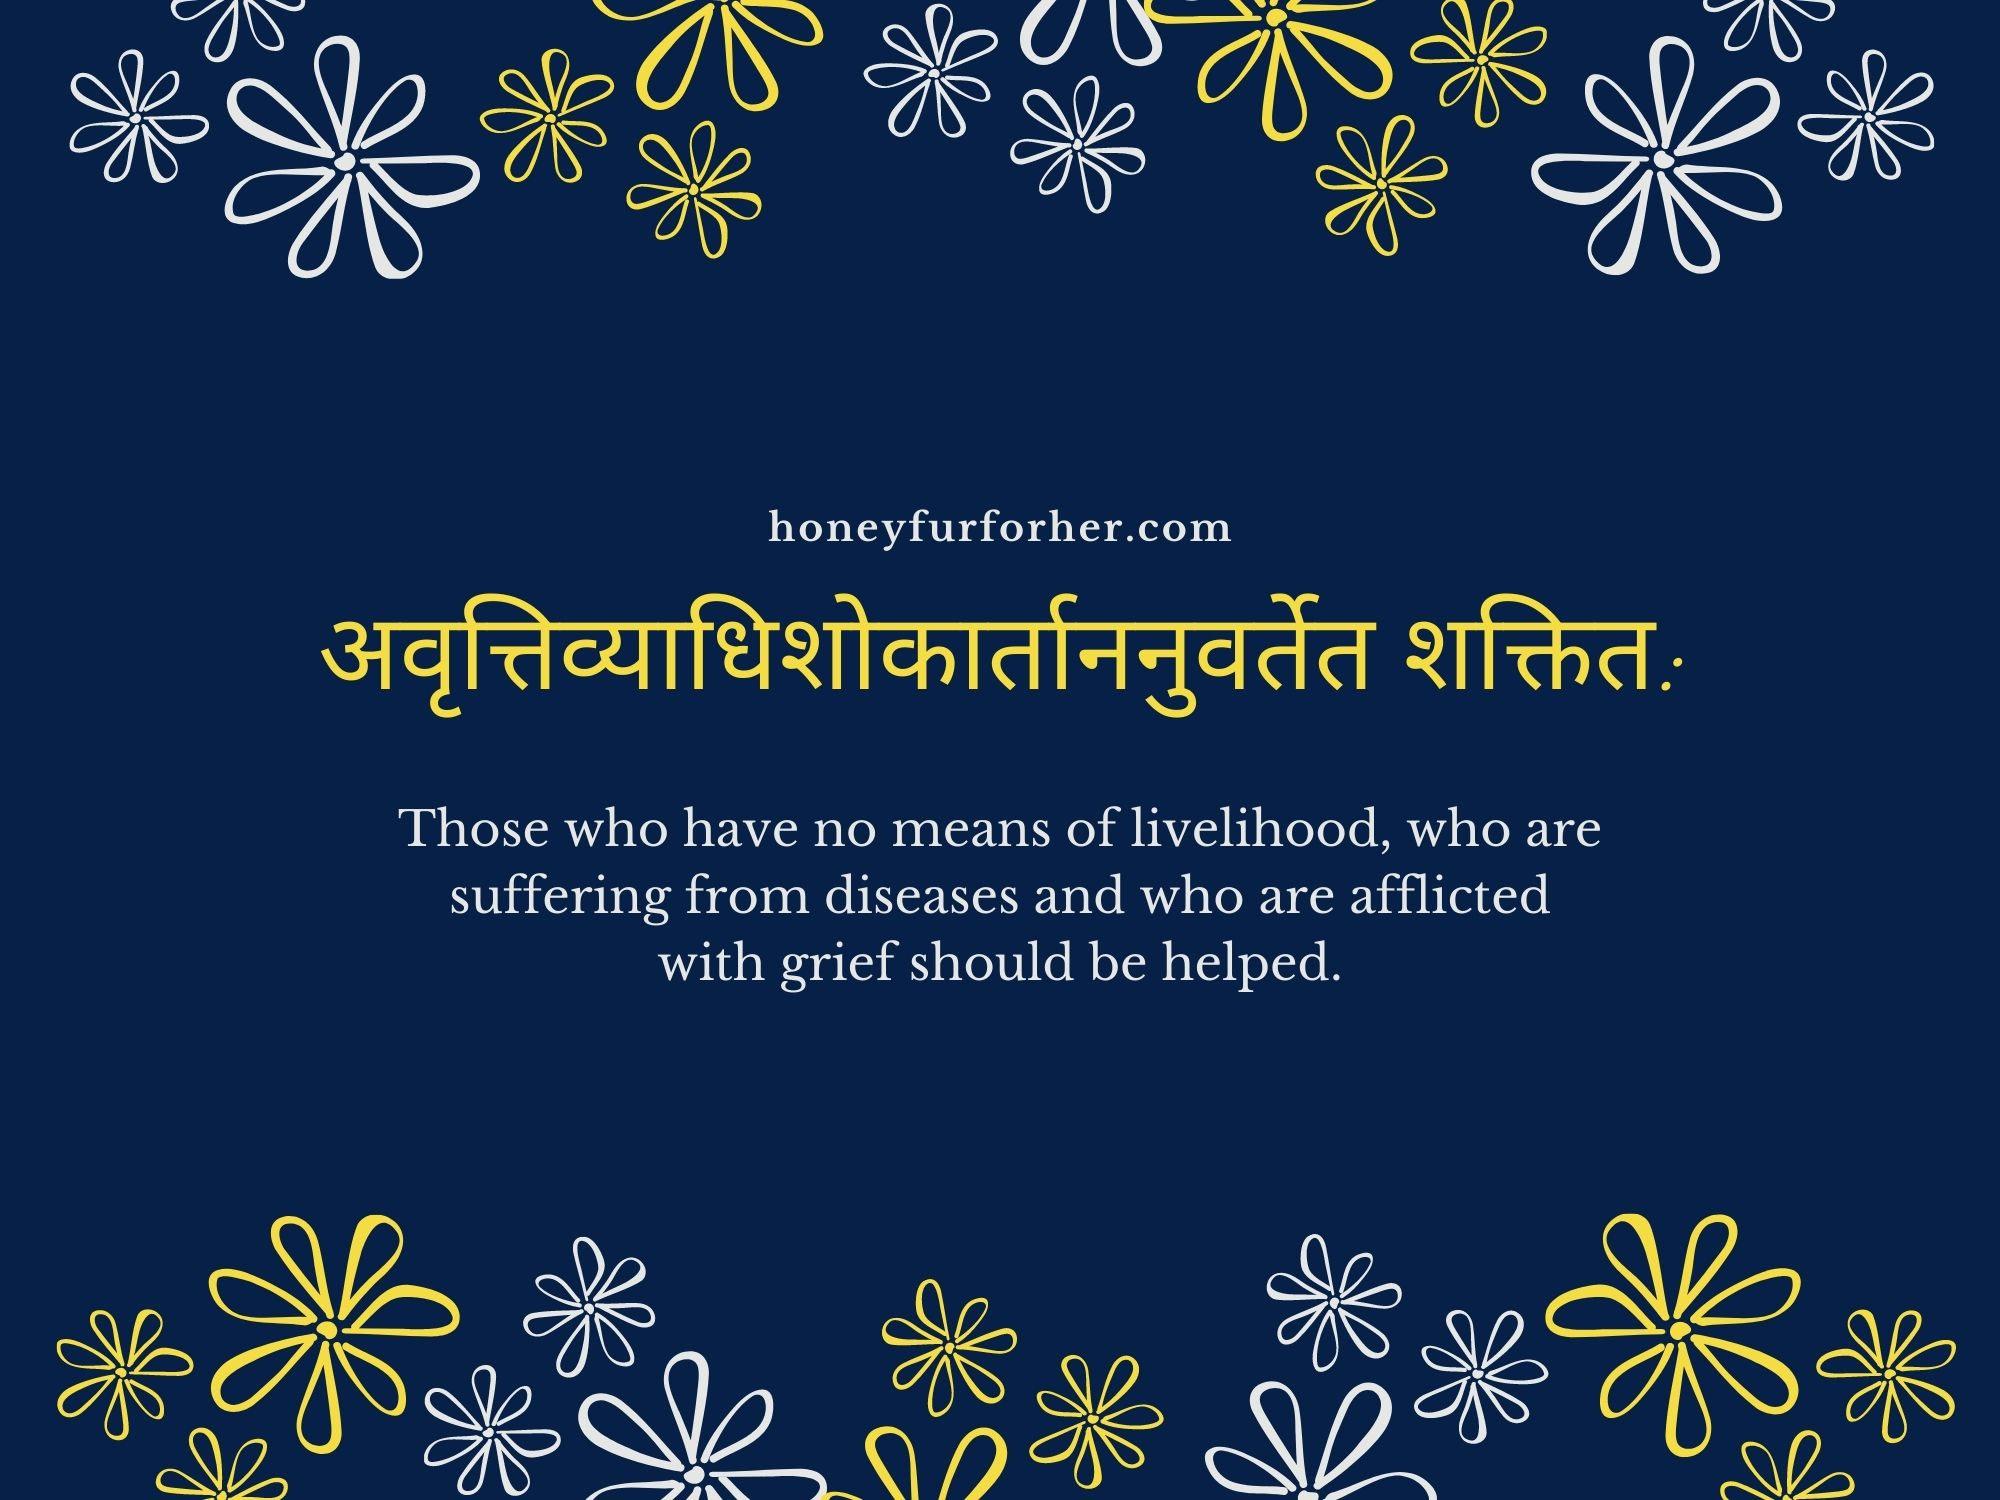 Ayurveda Quotes - Help To The Weak